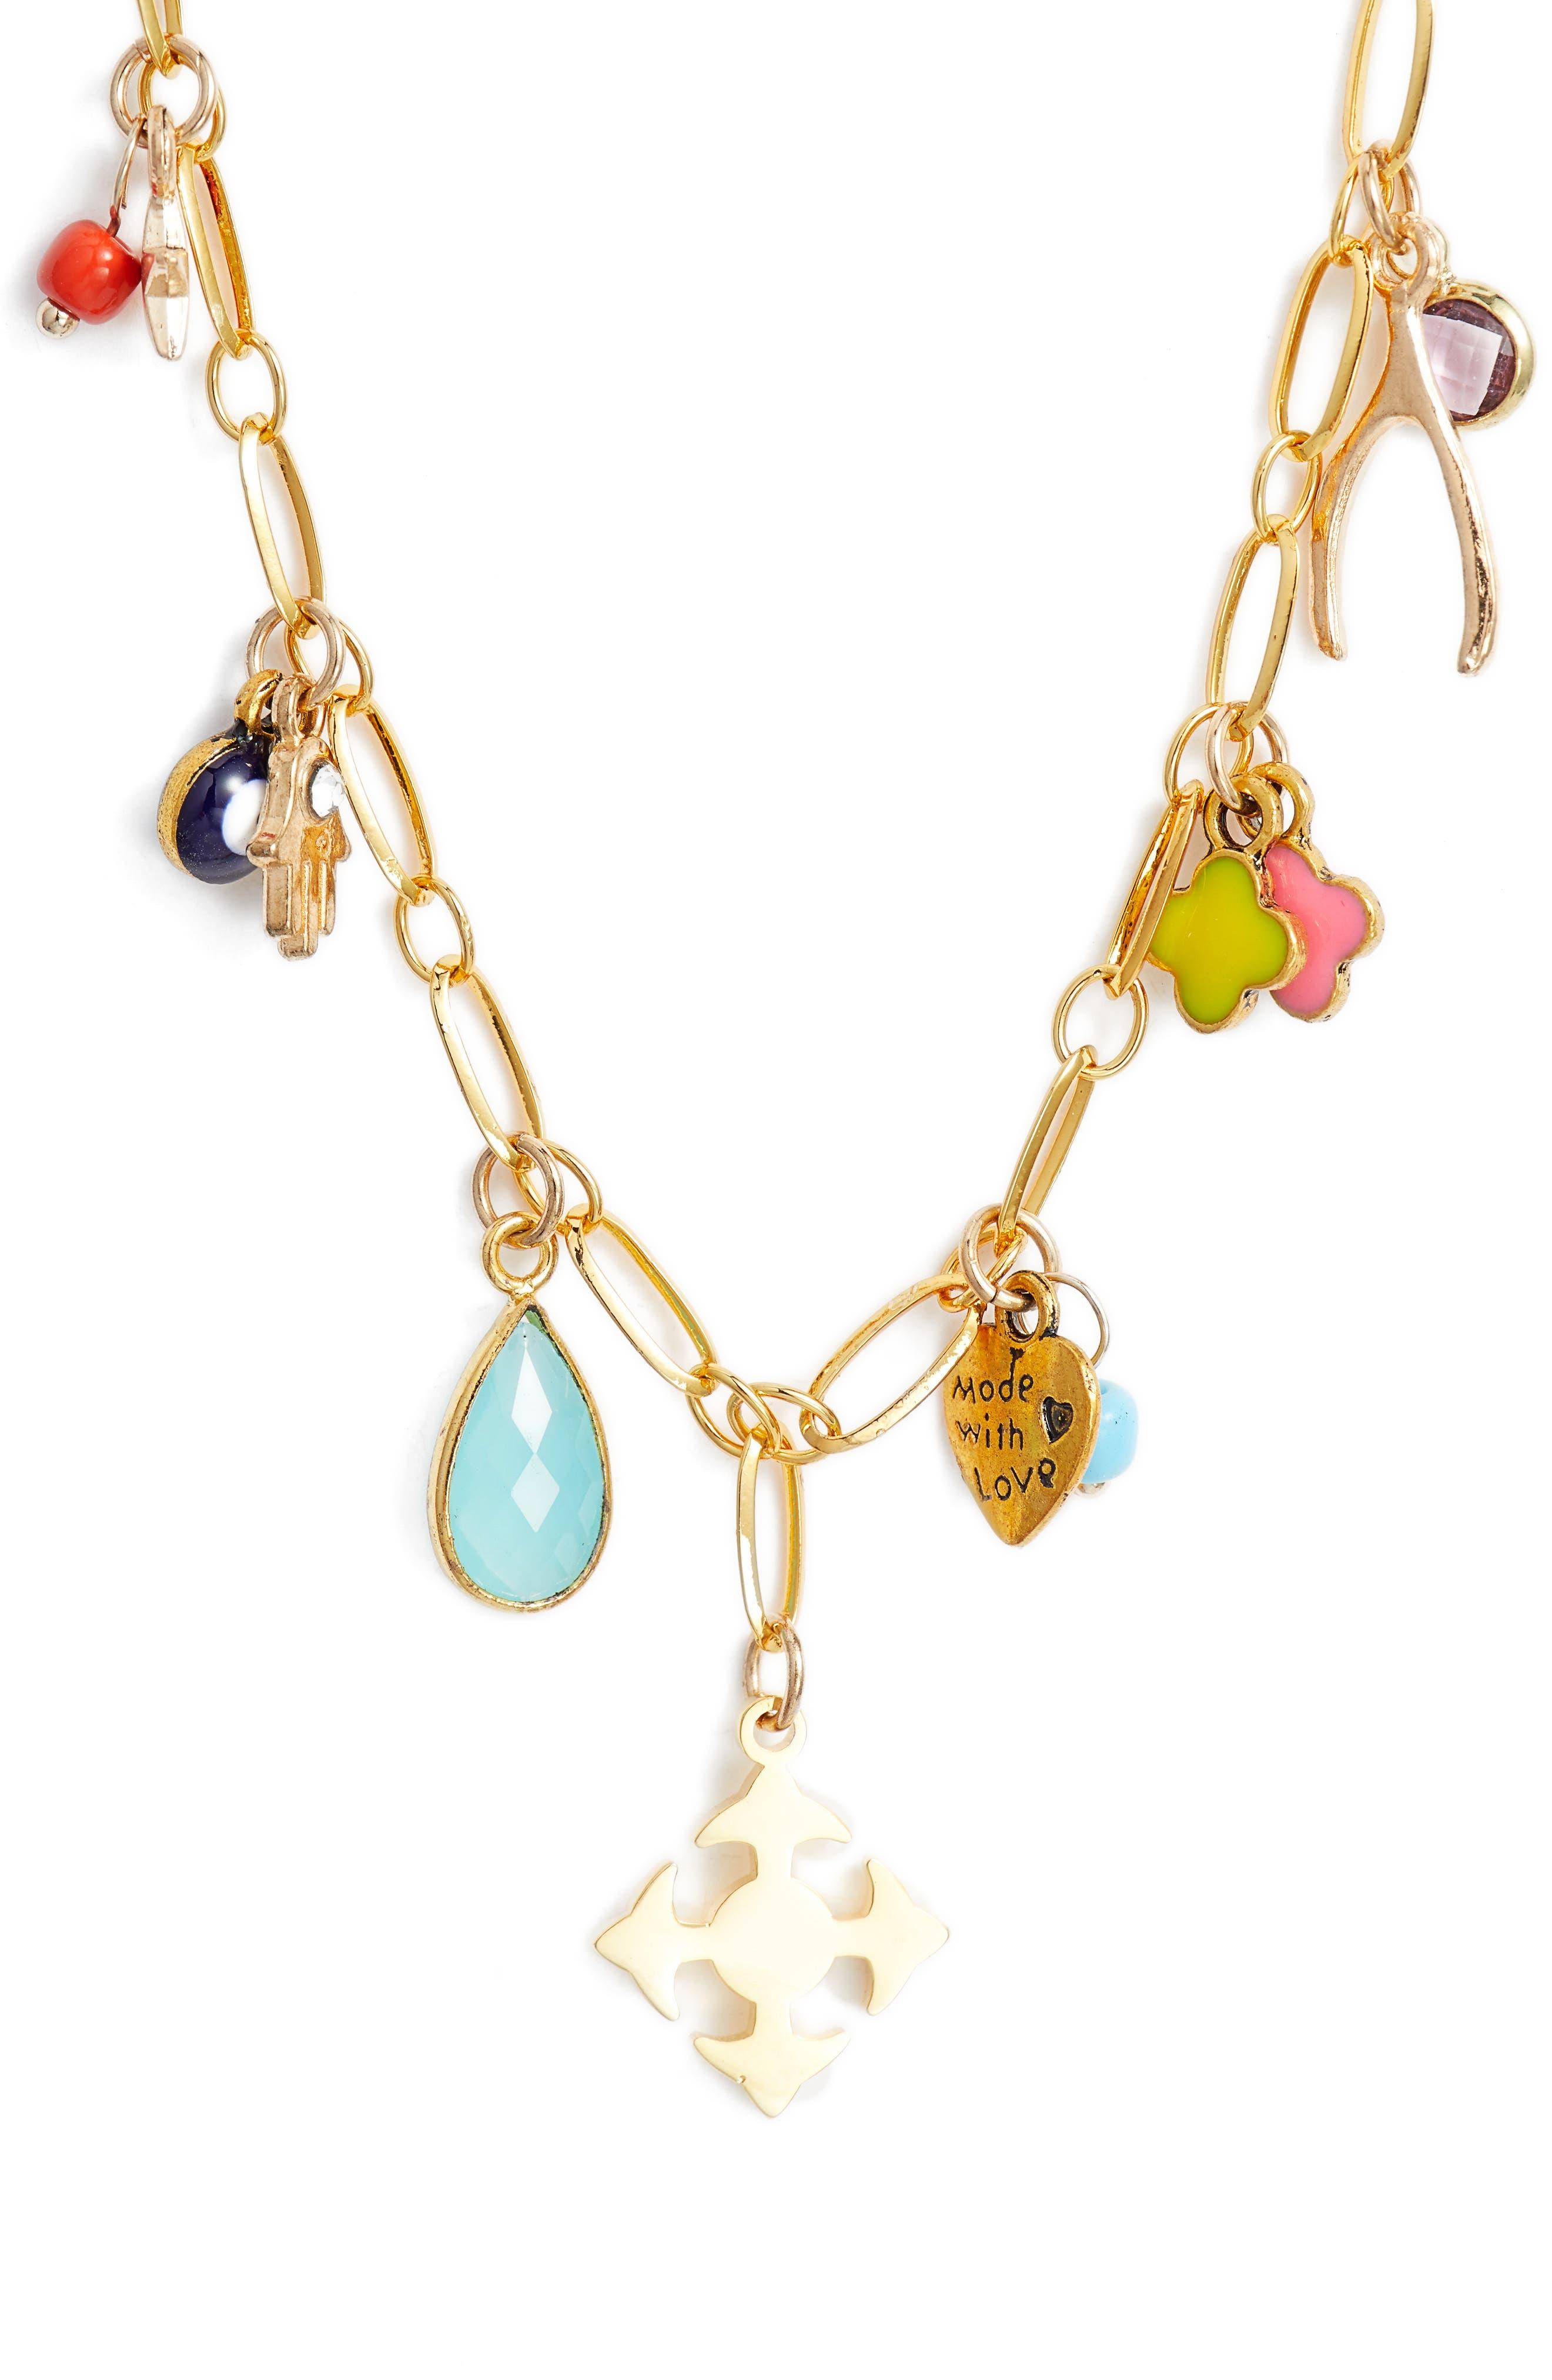 Lala Charm Necklace,                             Main thumbnail 1, color,                             710